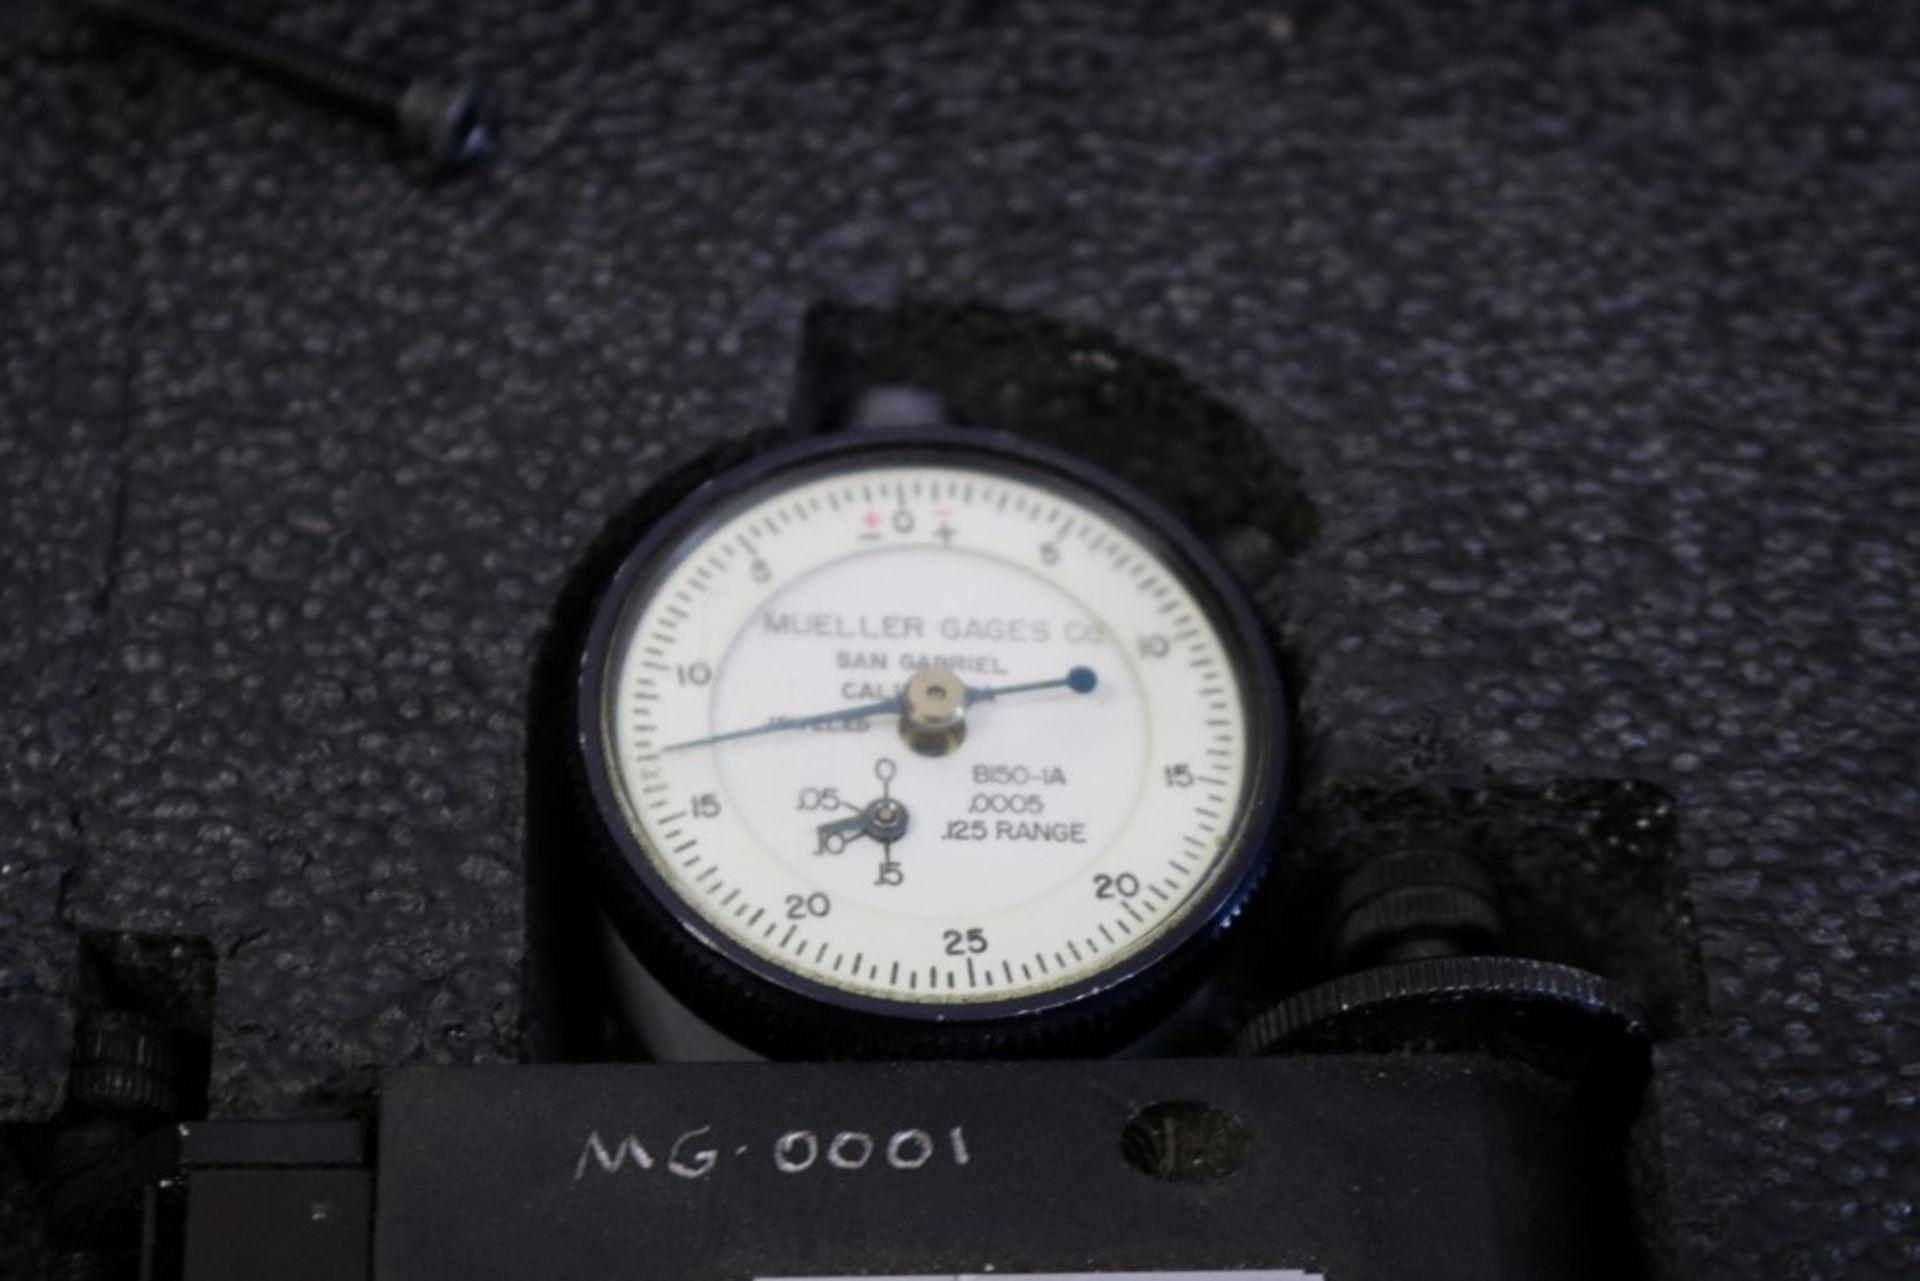 Lot 48 - Mueller Gage ID Indicator Model 179